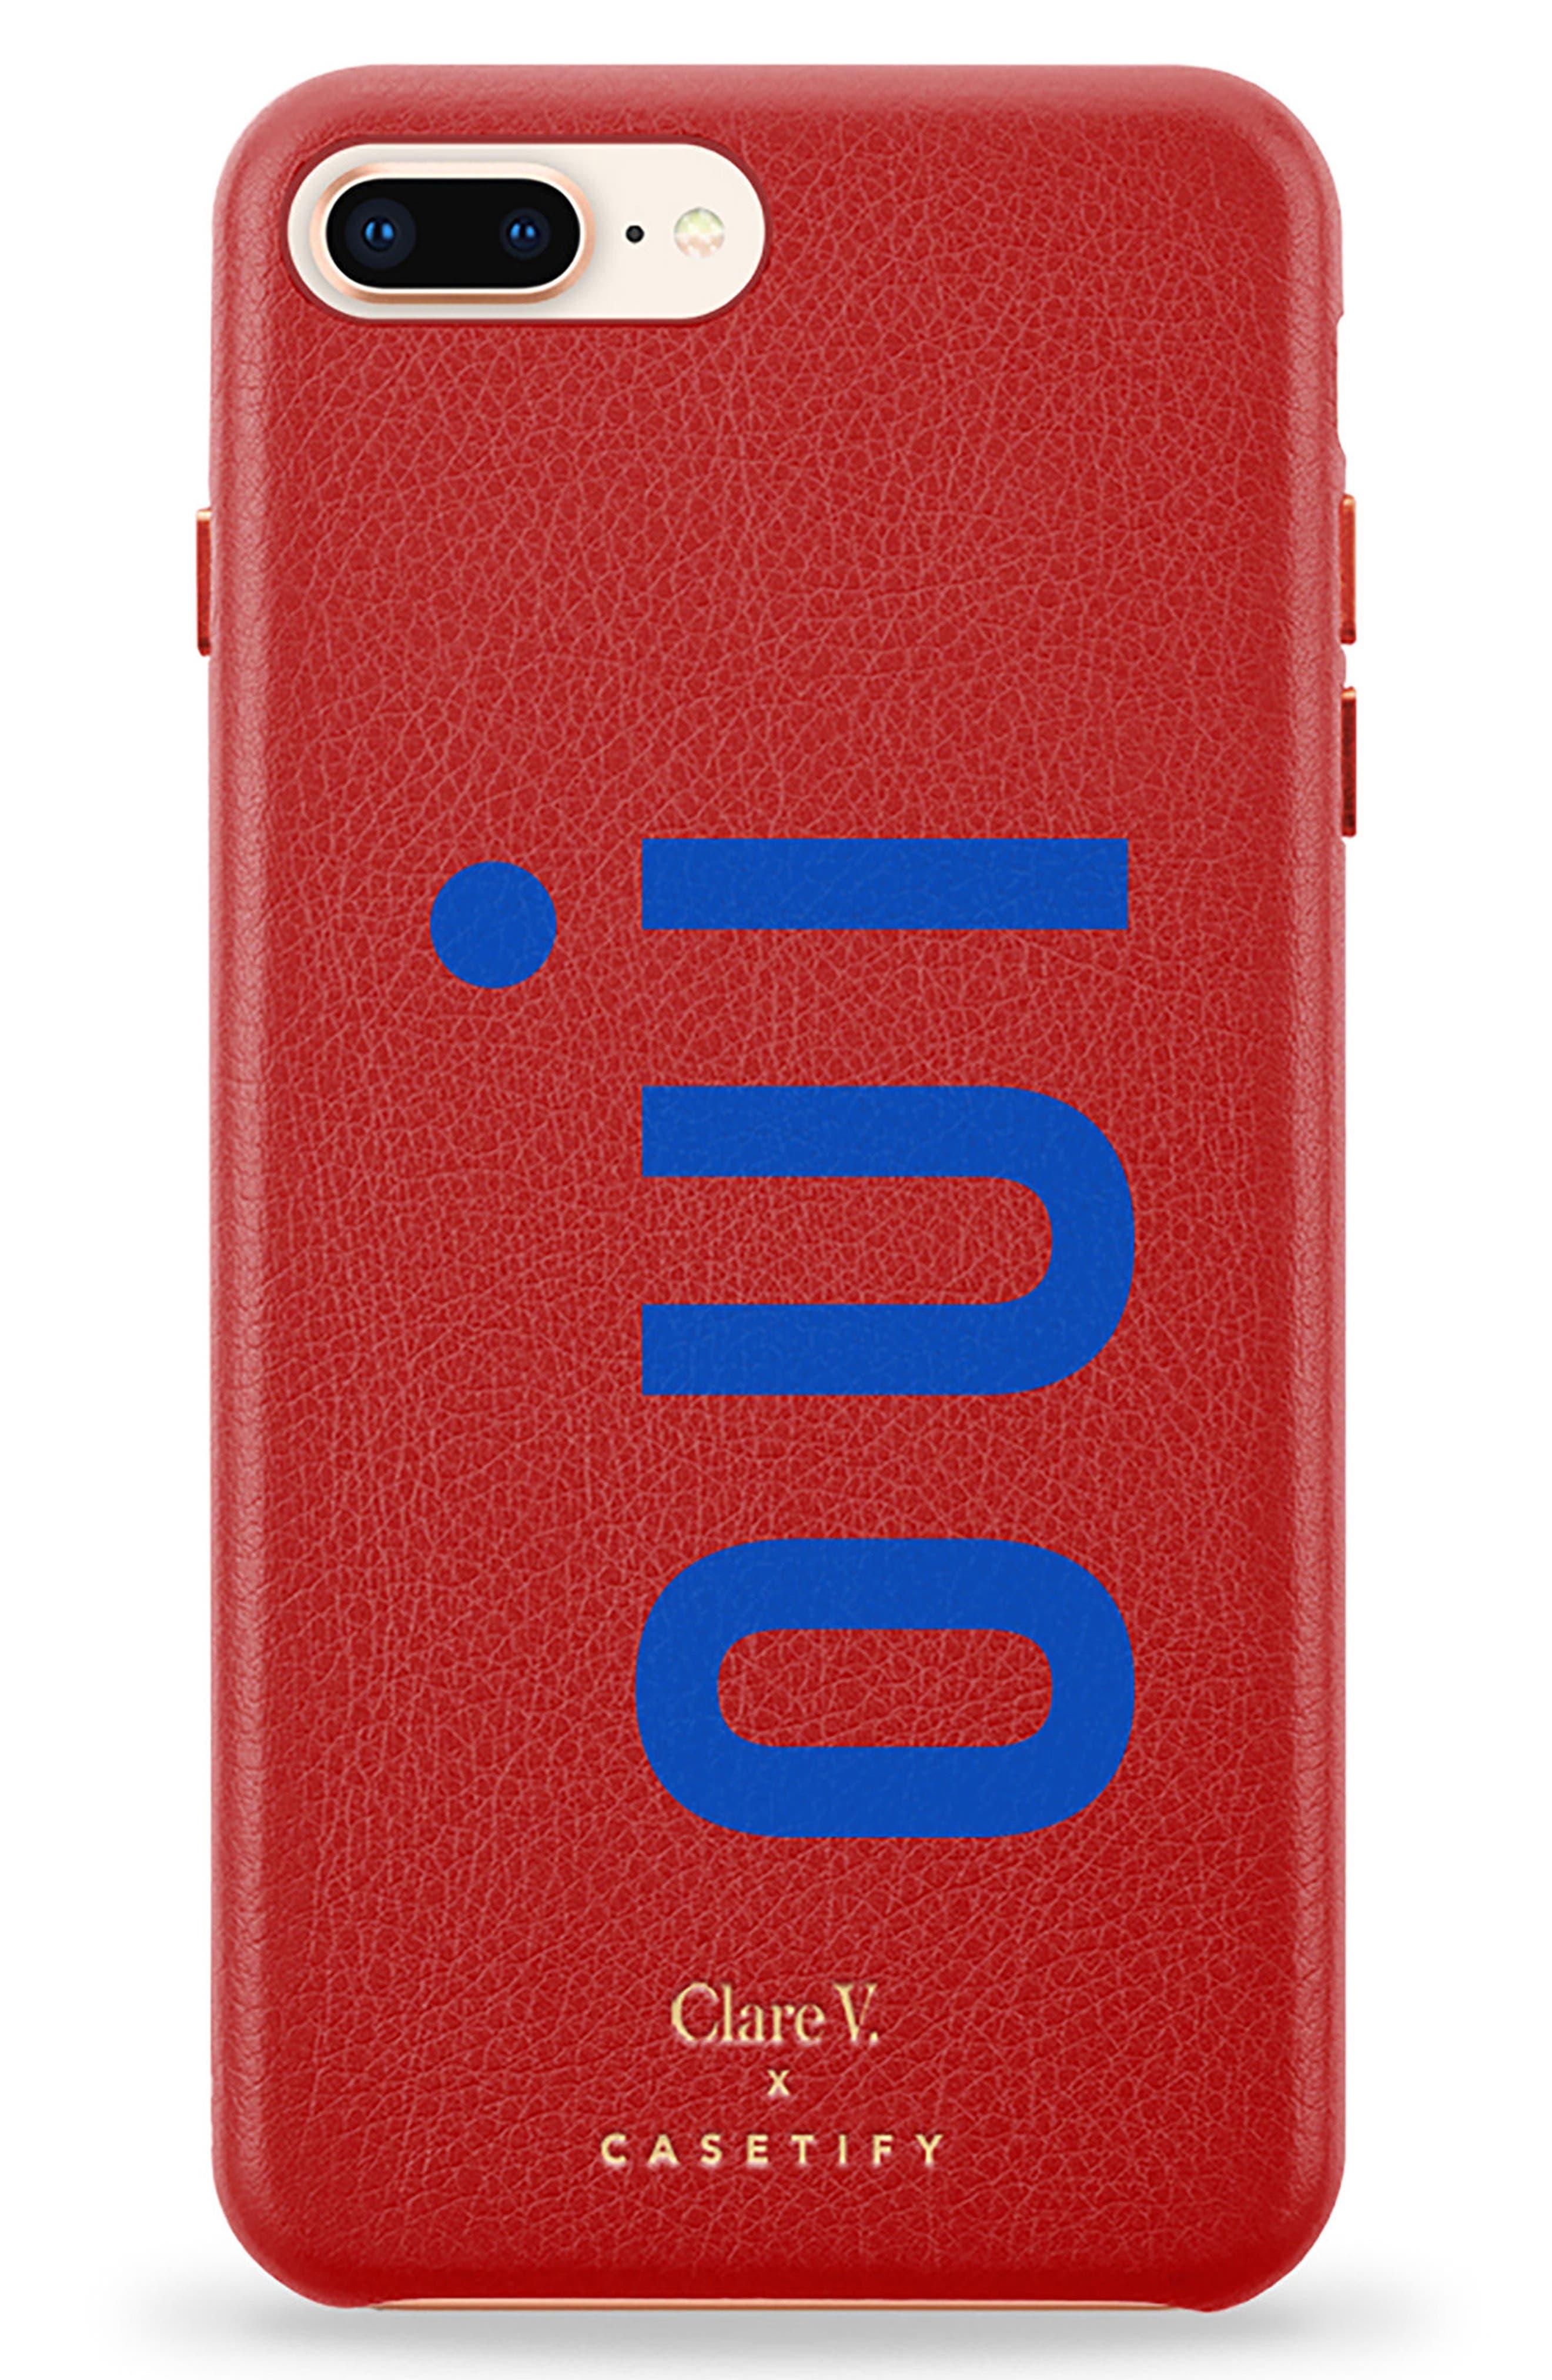 x Clare V. Oui Leather iPhone 7/8 & 7/8 Plus Case,                             Main thumbnail 1, color,                             600